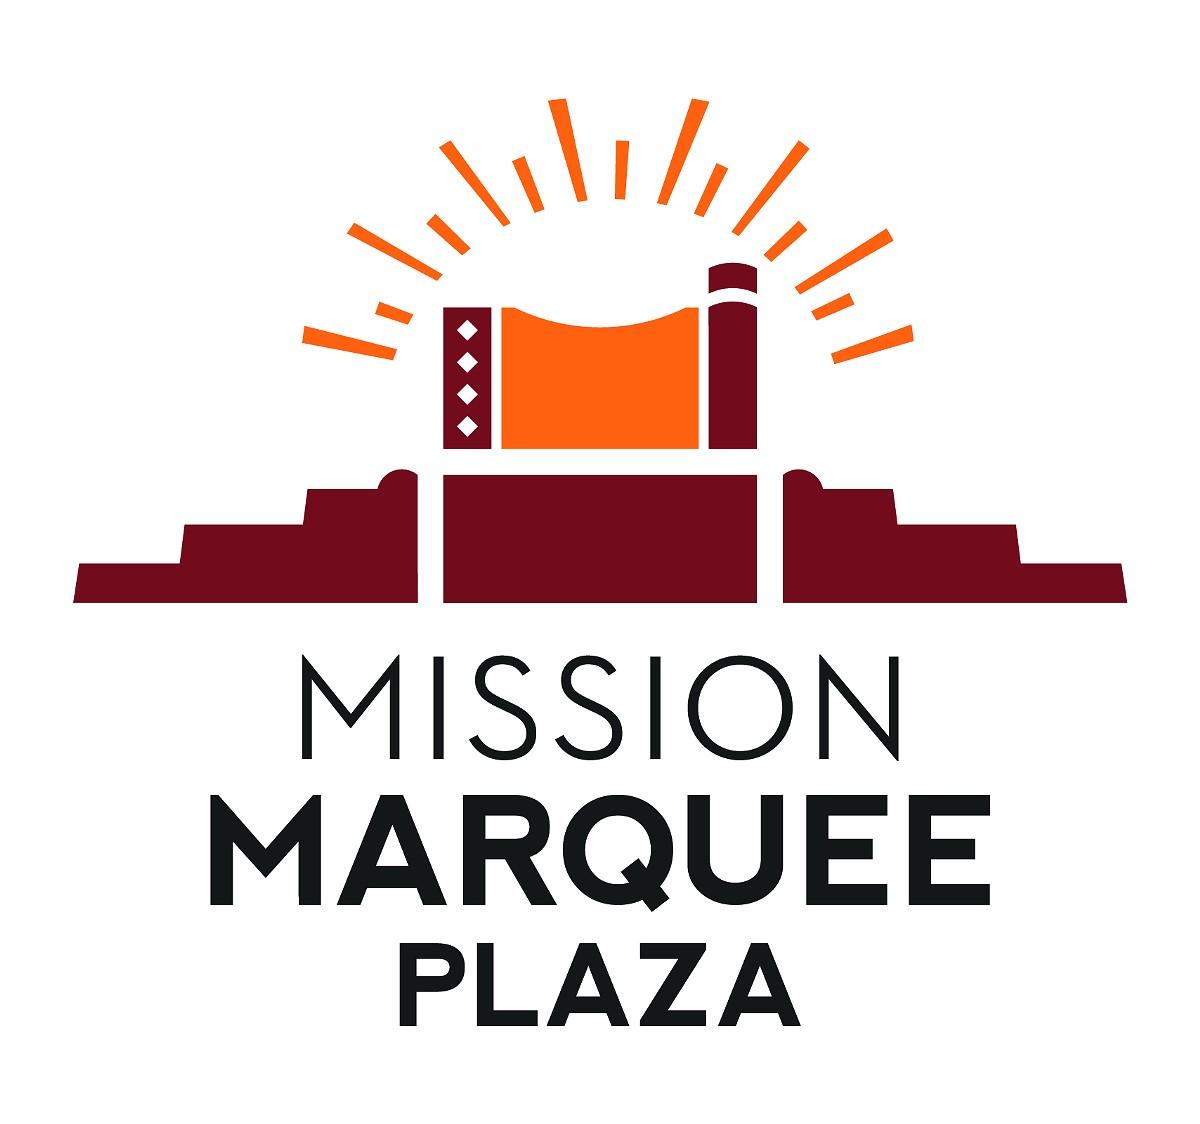 4da6c21b_mission-marquee_plaza_logo_stacked.jpg